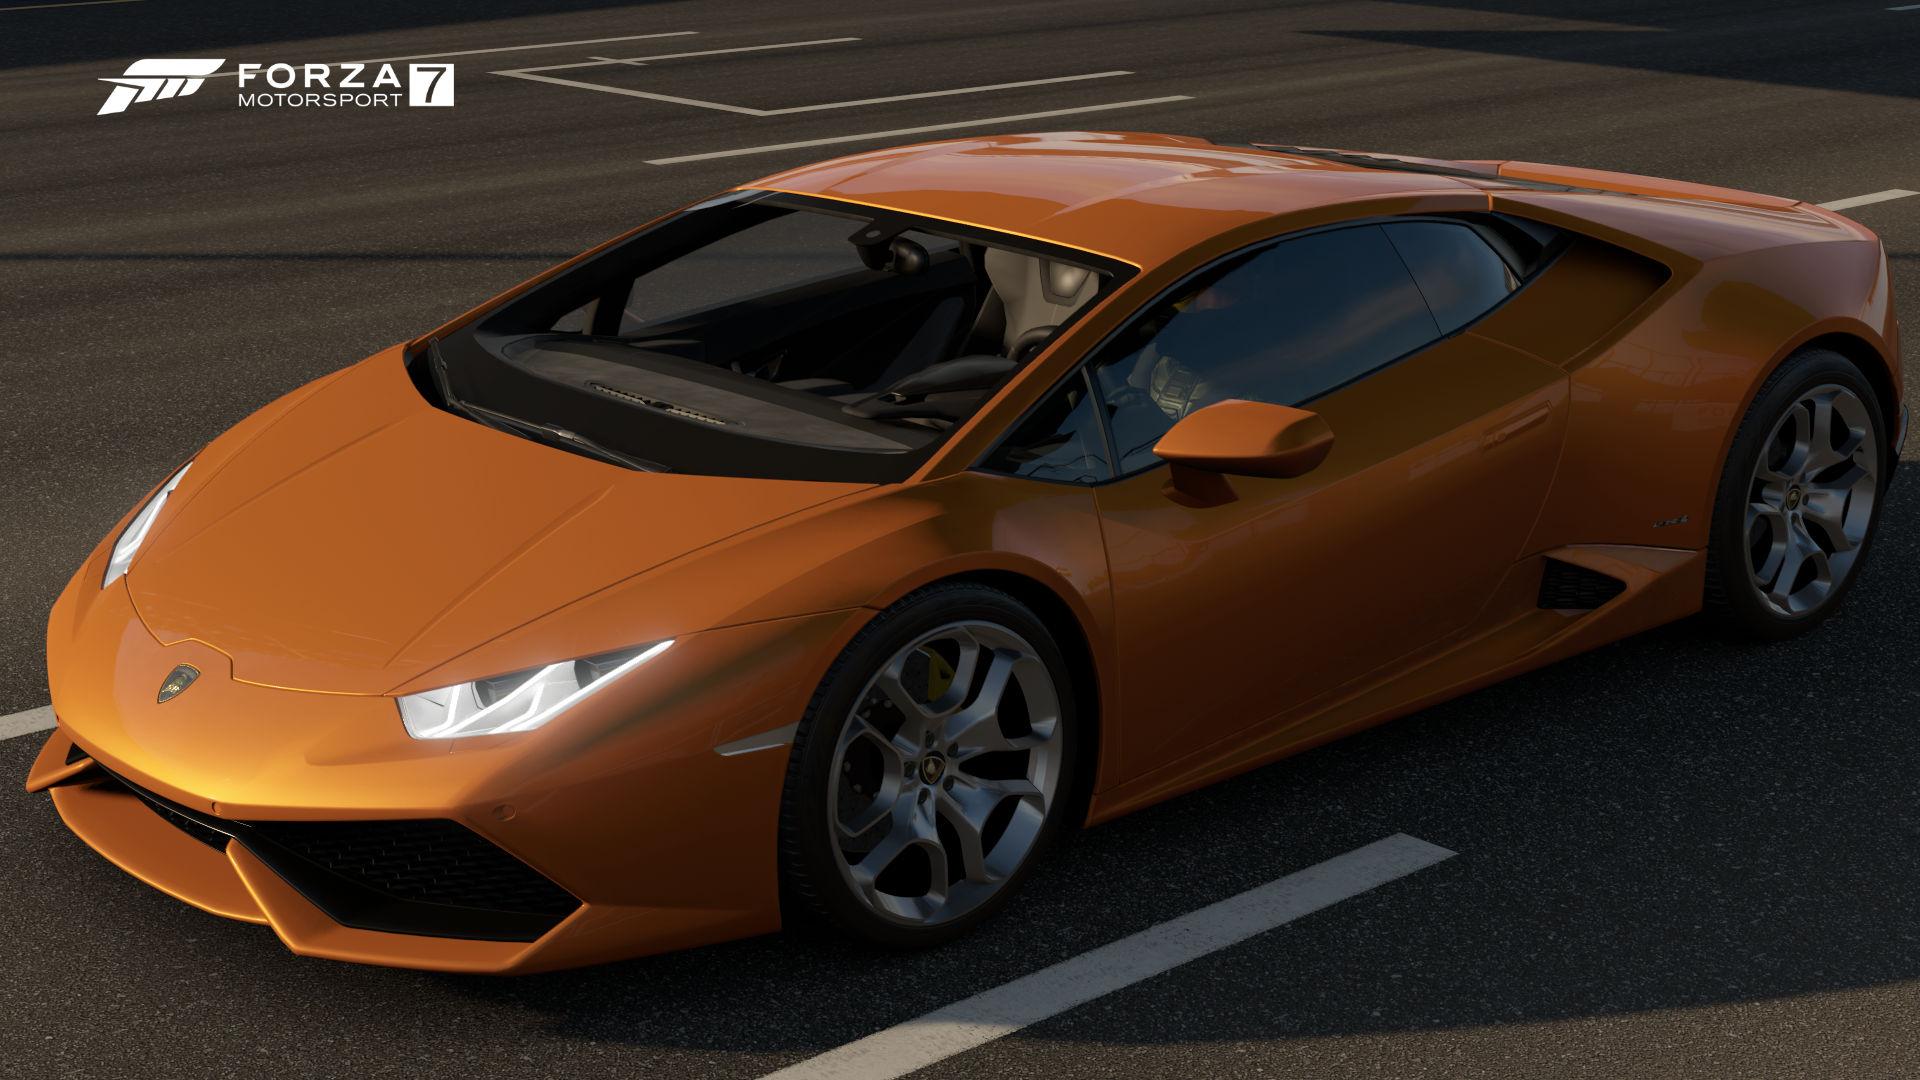 The 2014 Lamborghini Huracán LP 610 4 In Forza Motorsport 7